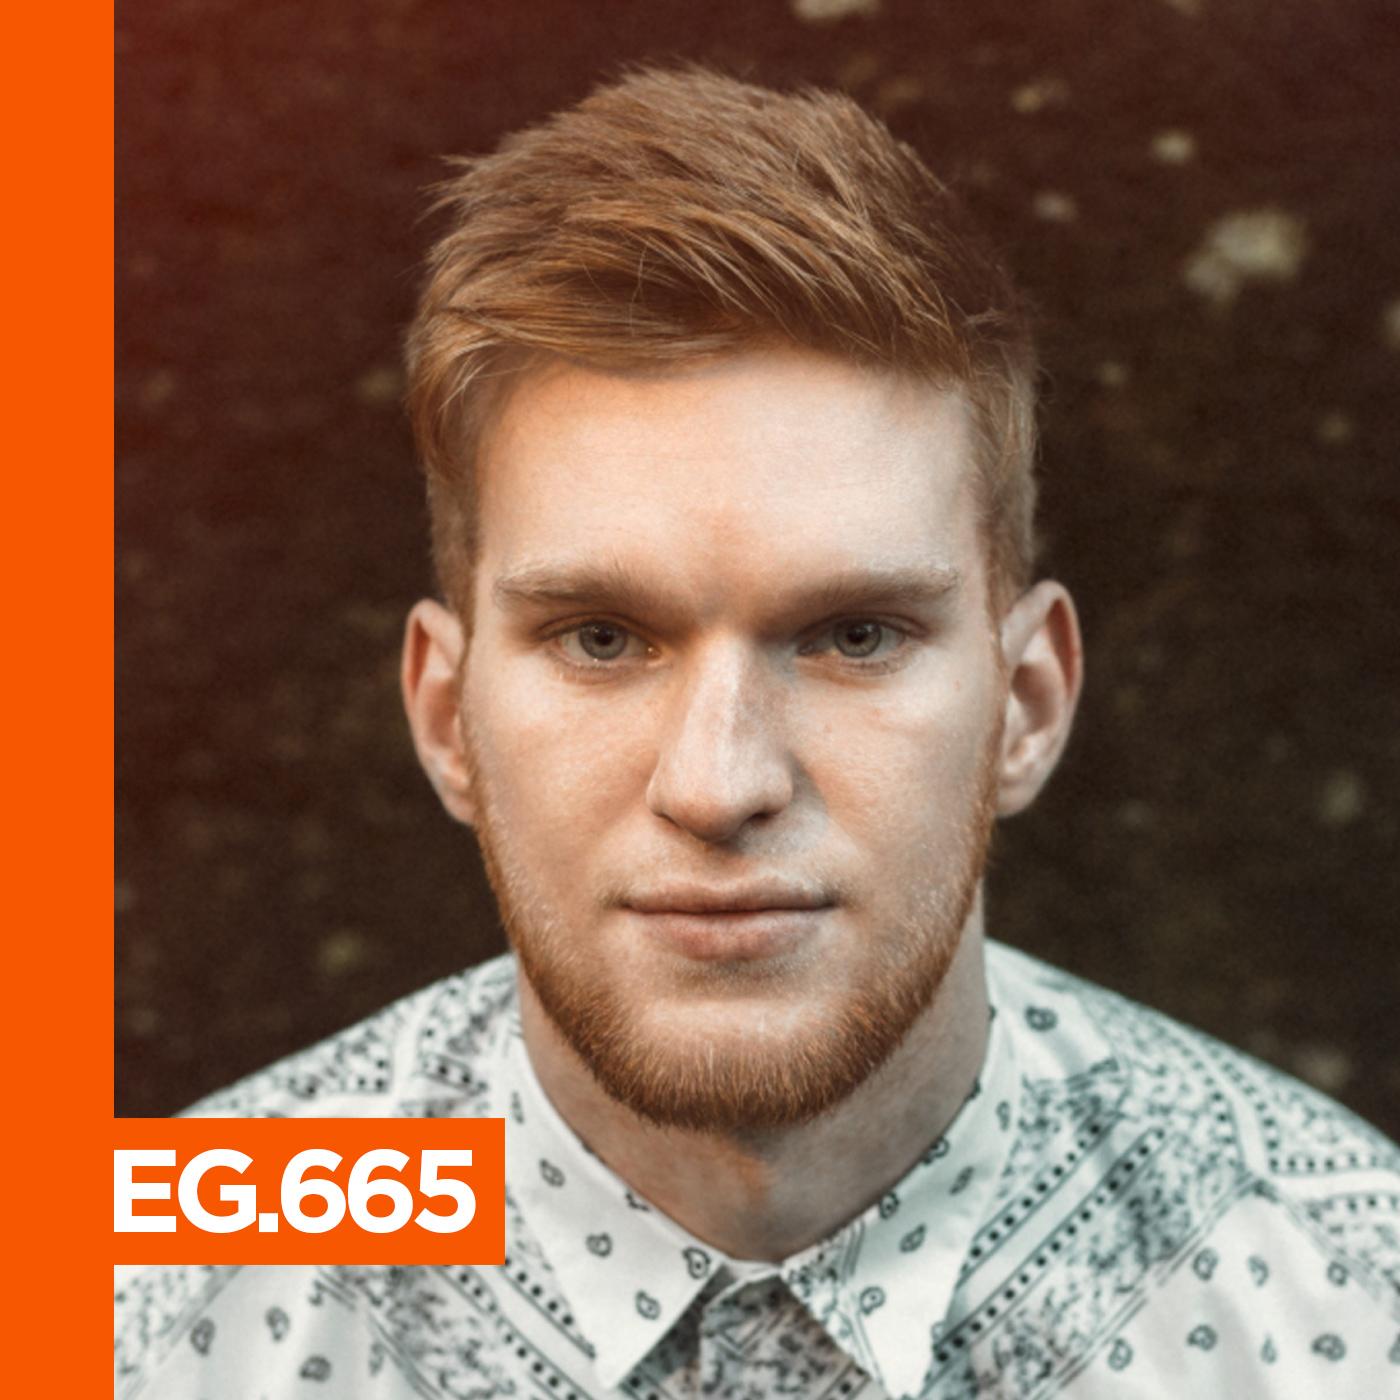 EG.665 Tim Engelhardt